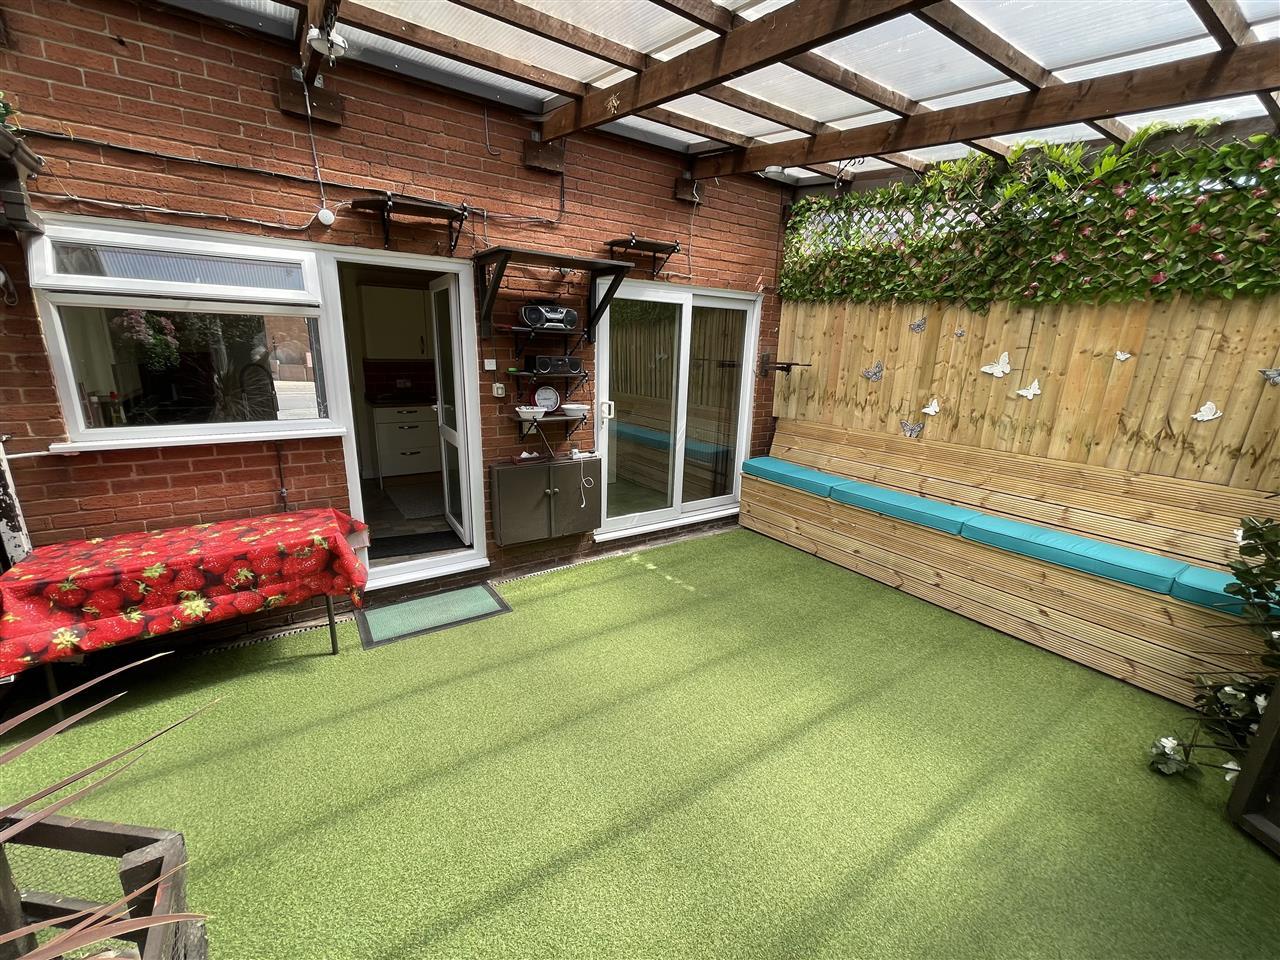 3 bed semi-detached for sale in Balmoral, Adlington, Adlington 10